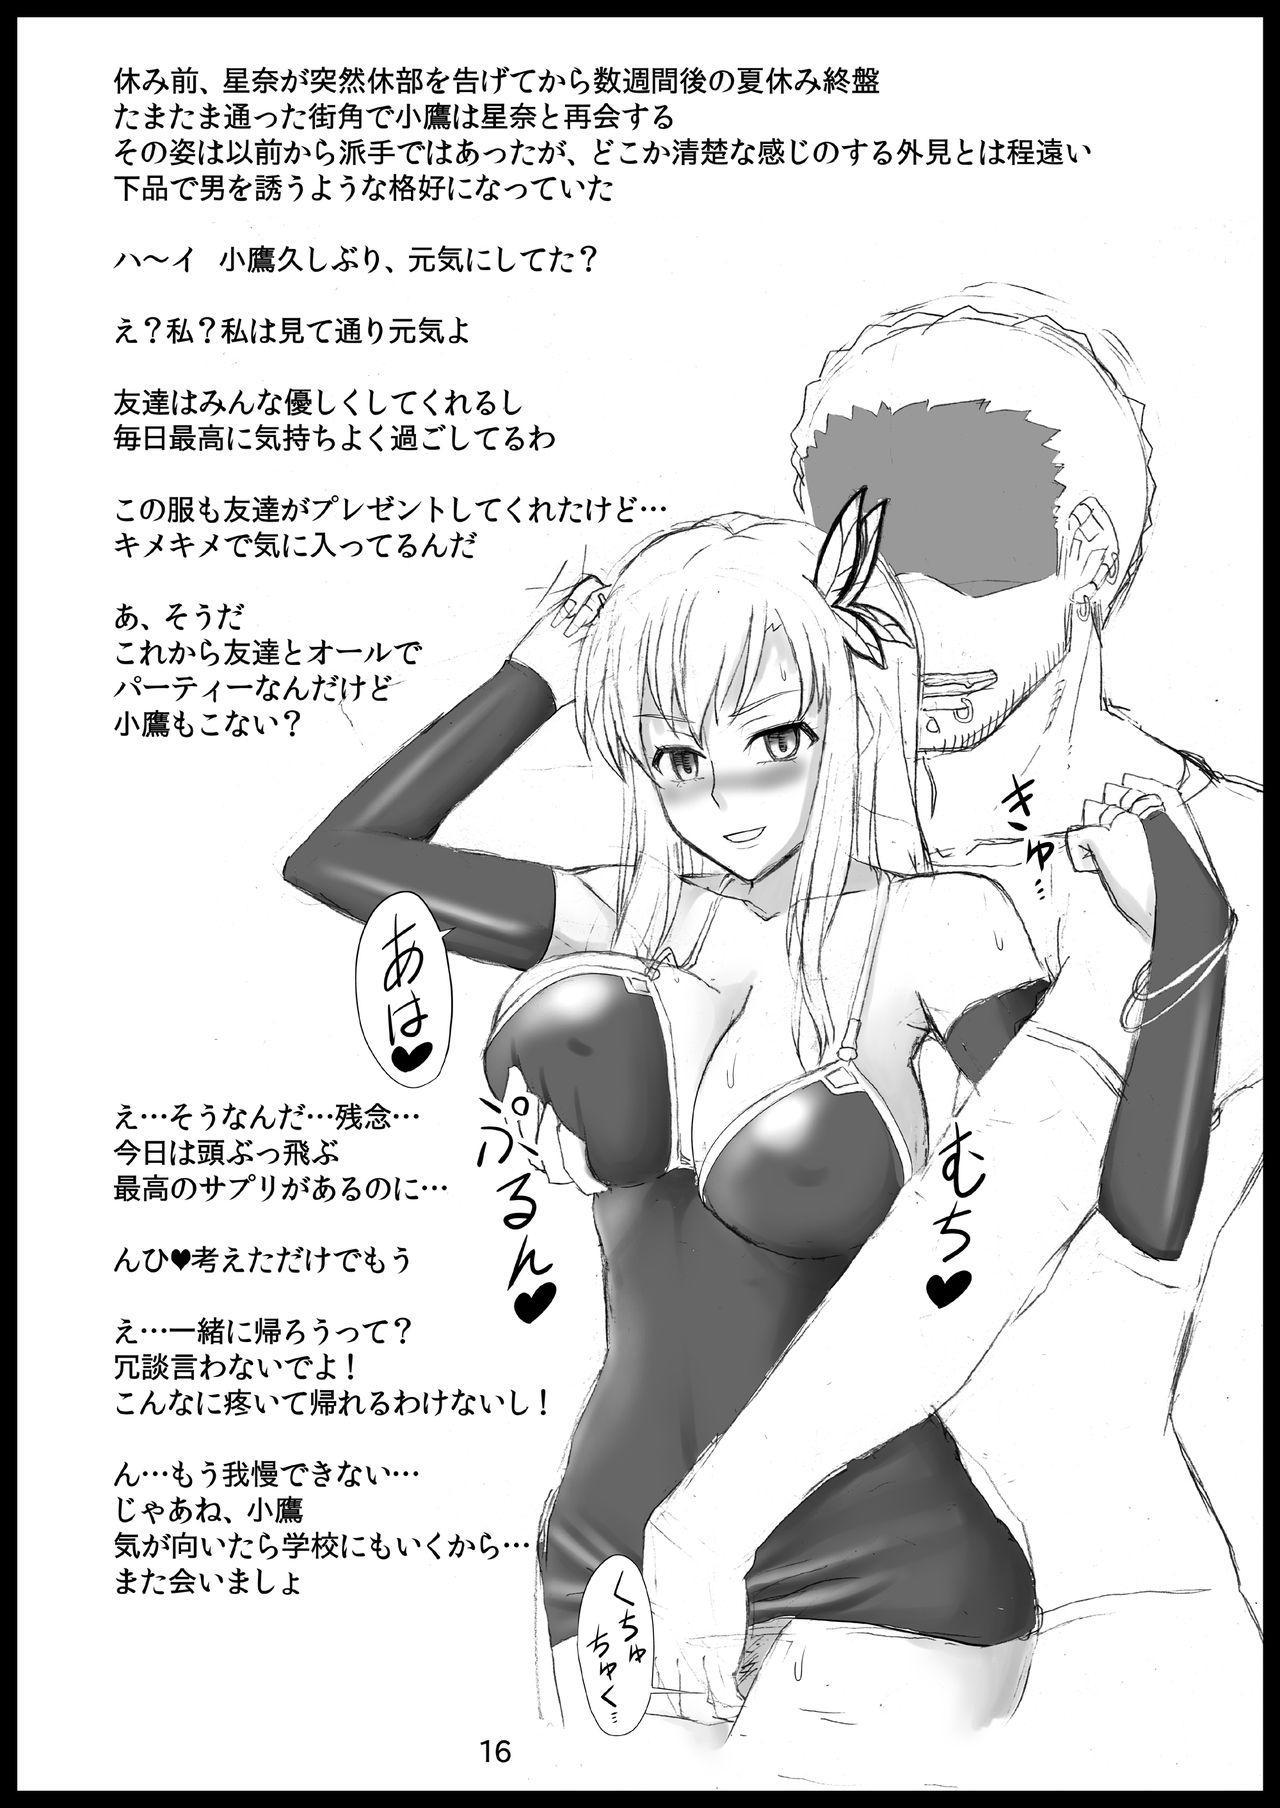 Kusurizuke! Sennou! Kikai Kaizou! Kuroochi Bitch-ka Heroine +α 179